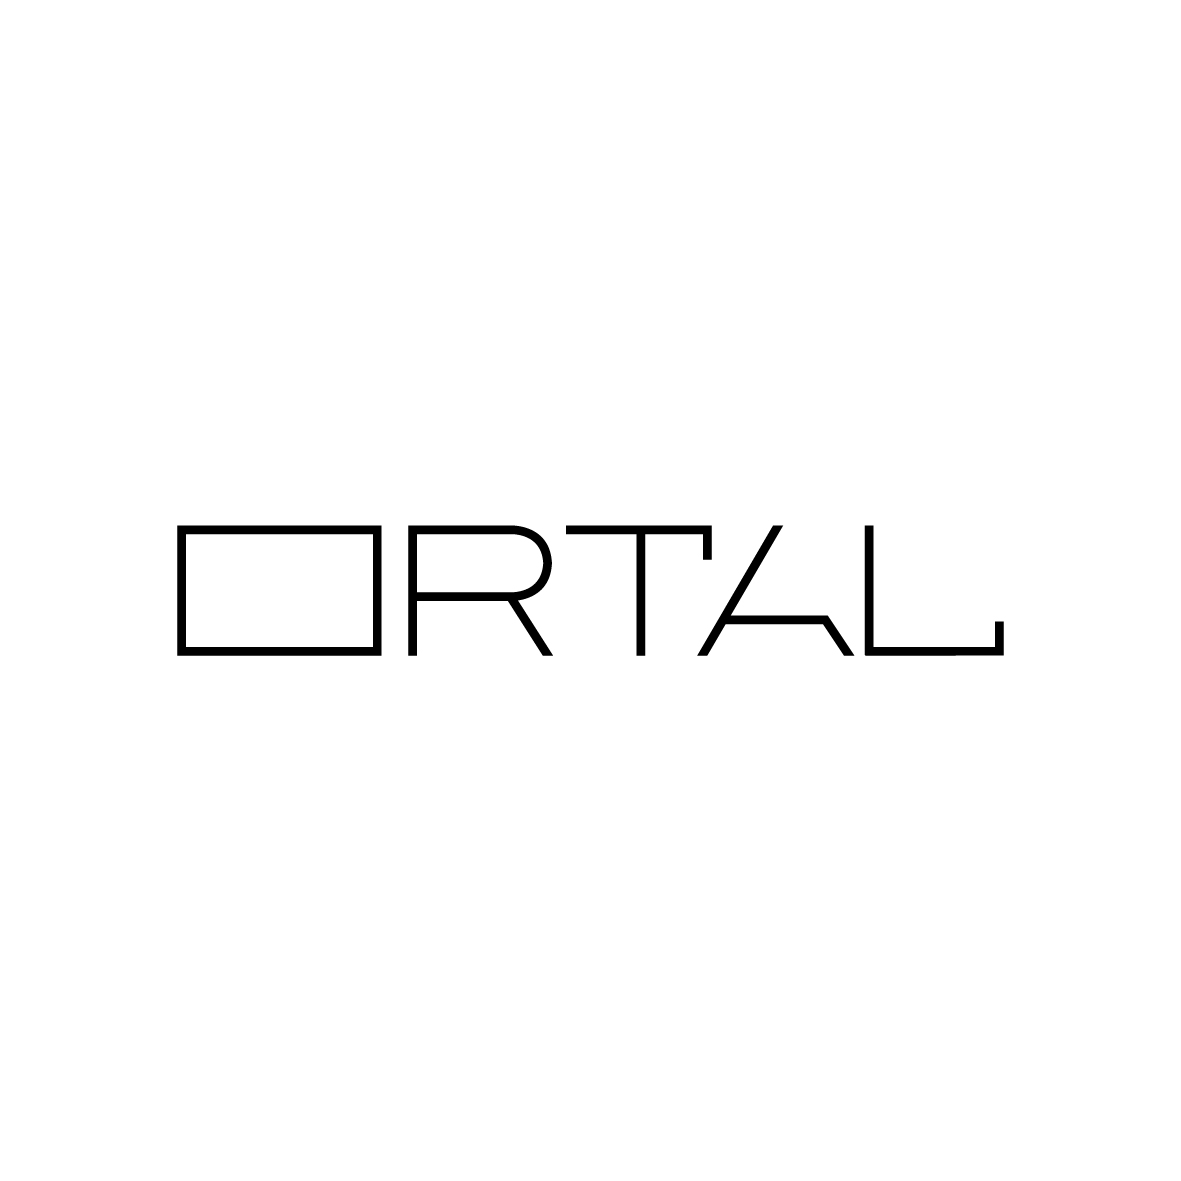 ortal logo.jpg